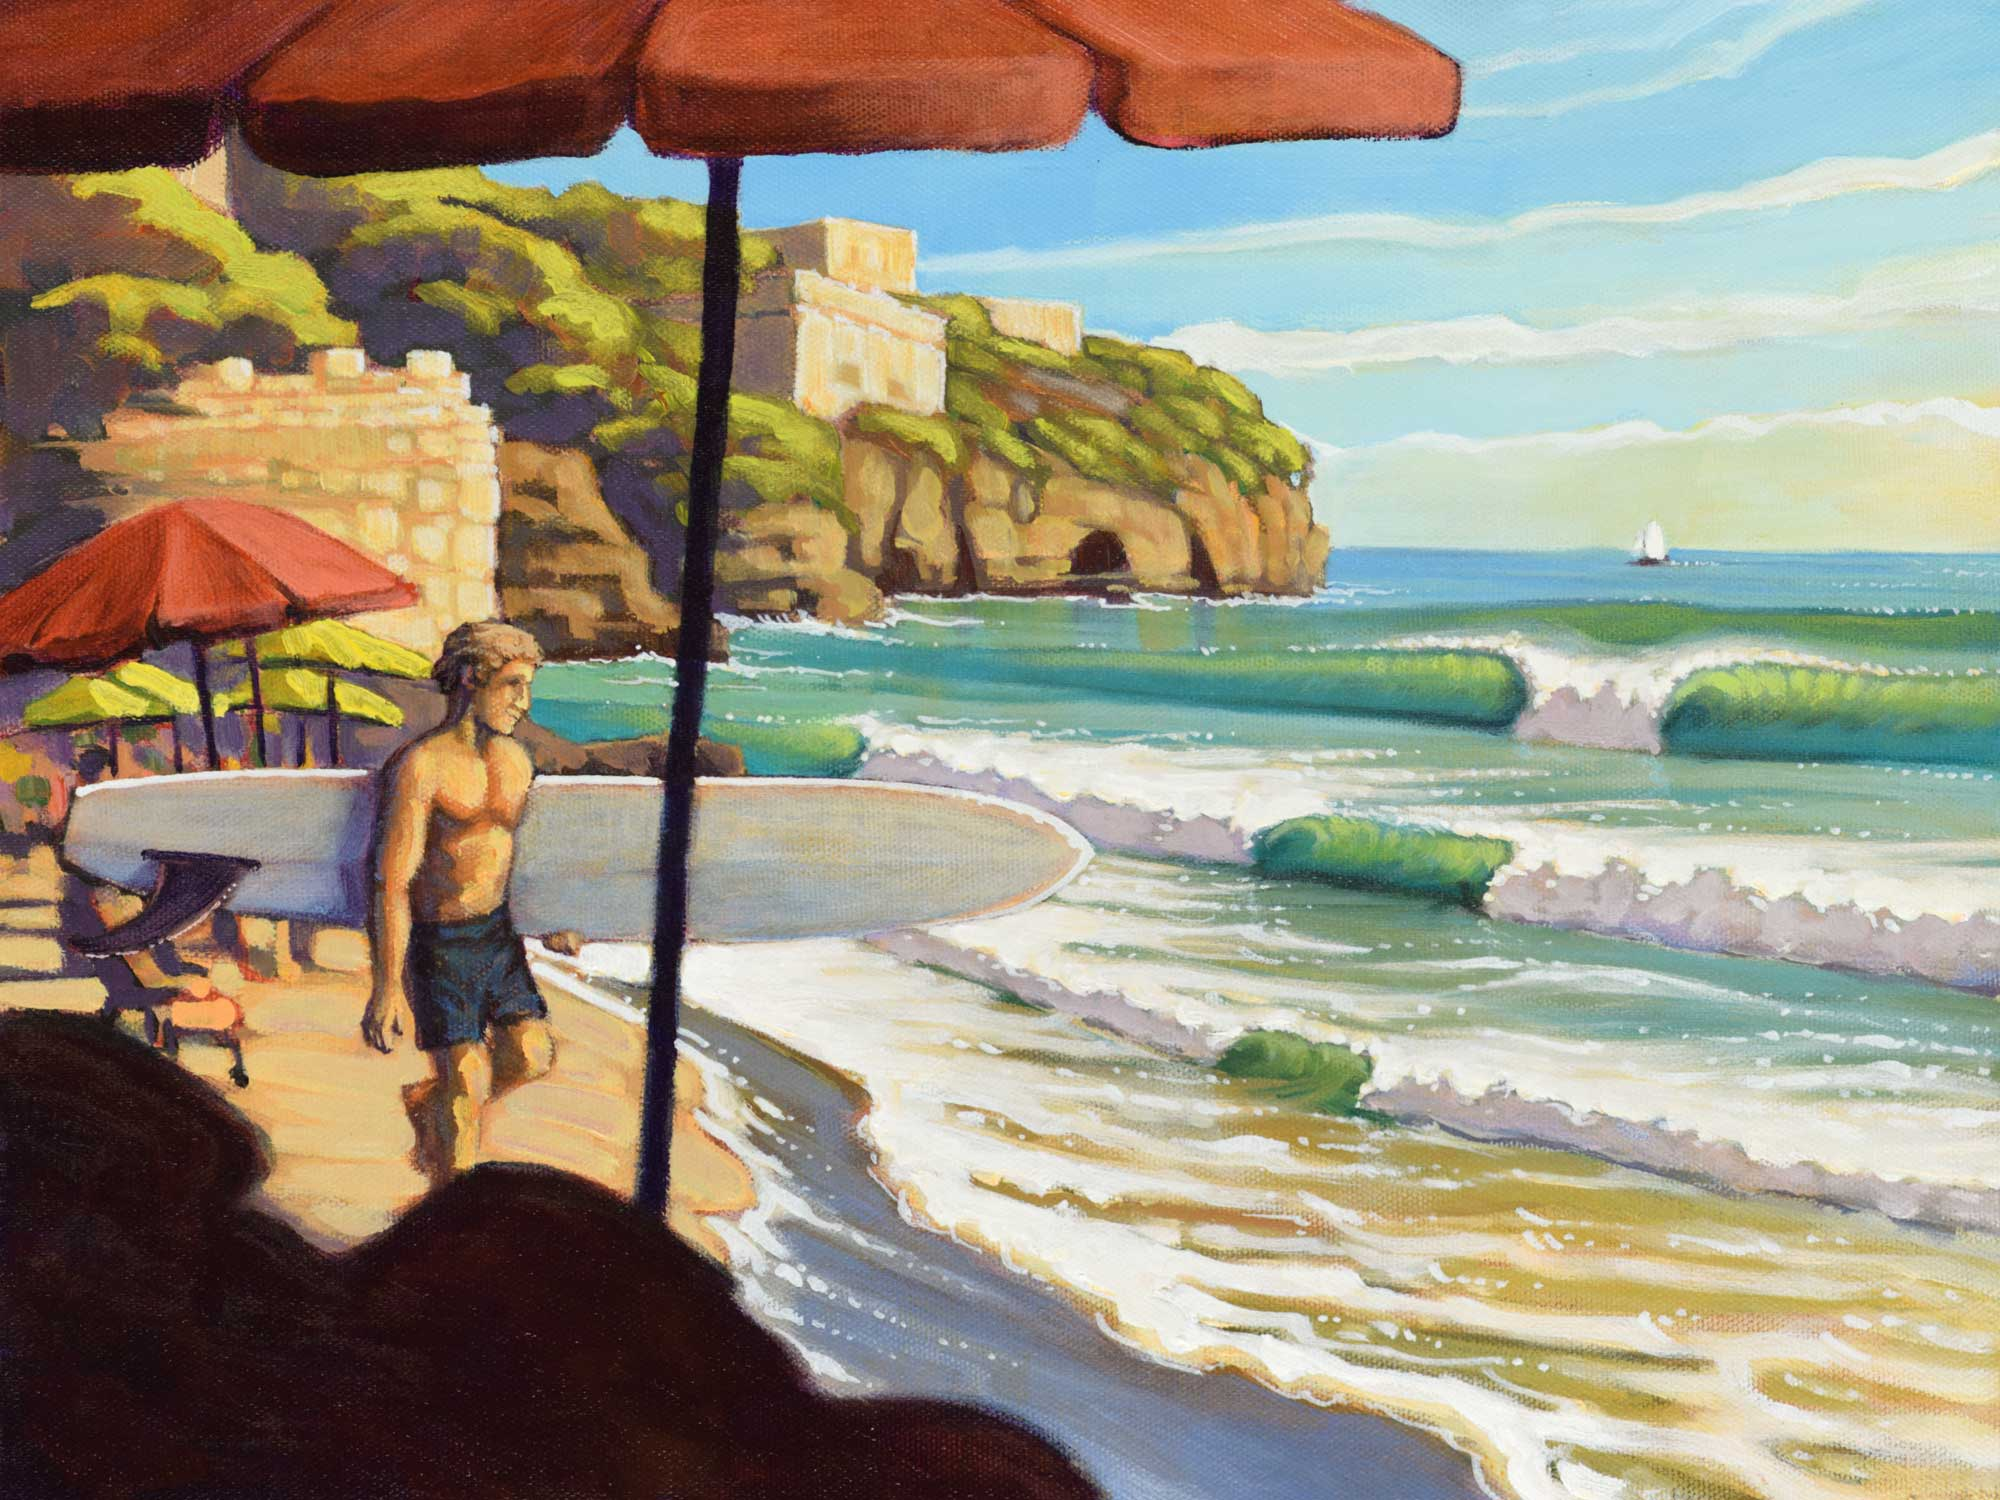 Painting of Dwight Harrington carrying a surfboard on Serrapo Beach, near Gaeta, Italy